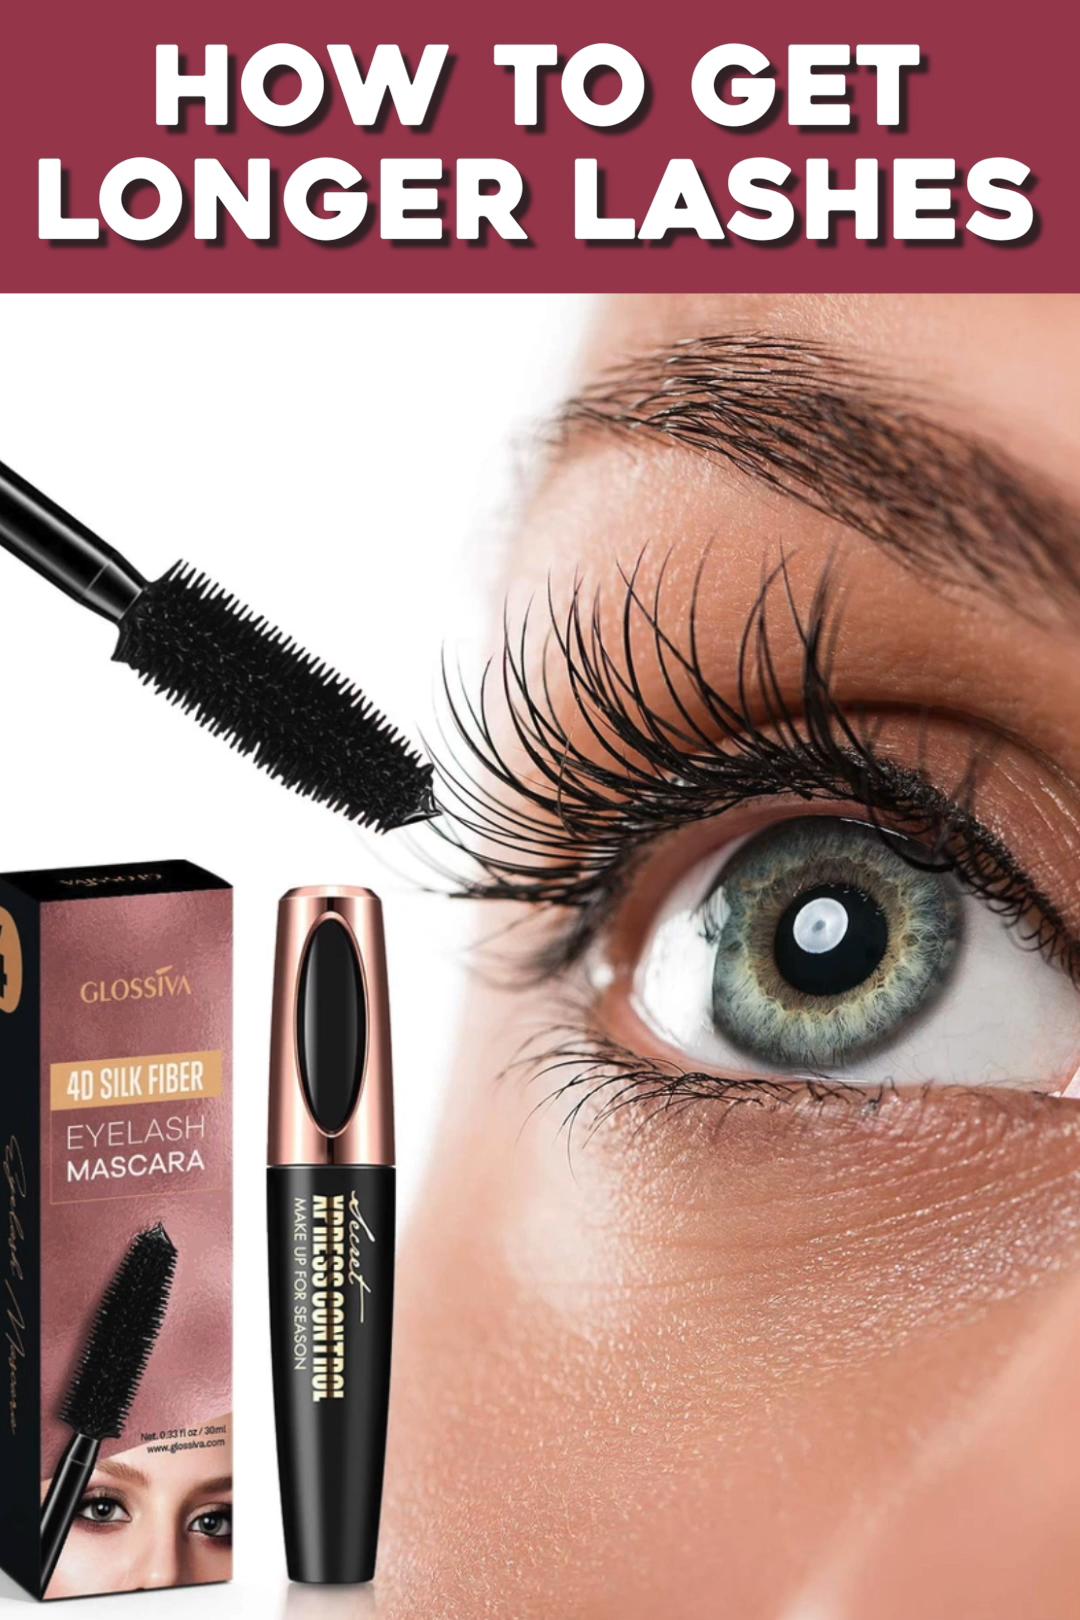 Photo of Silk Fiber Eyelash Mascara